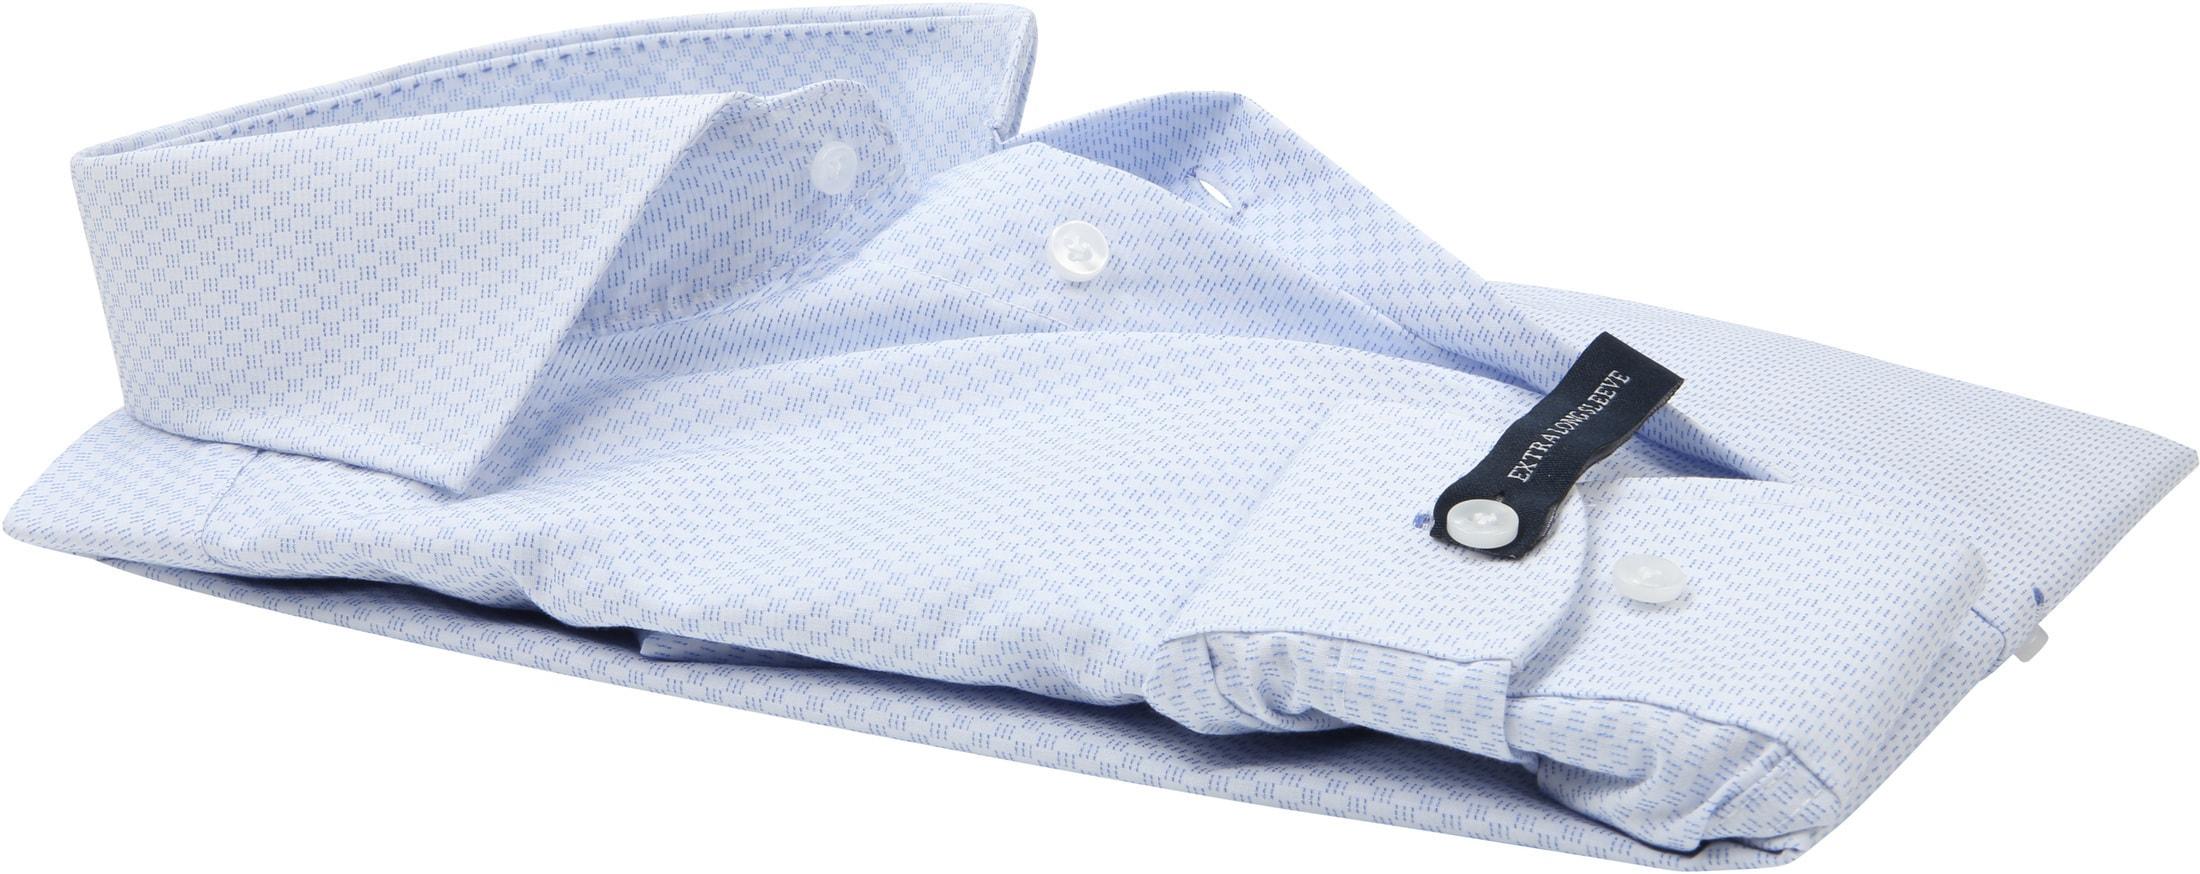 Profuomo Slim-Fit Overhemd Blauw SL7 foto 3